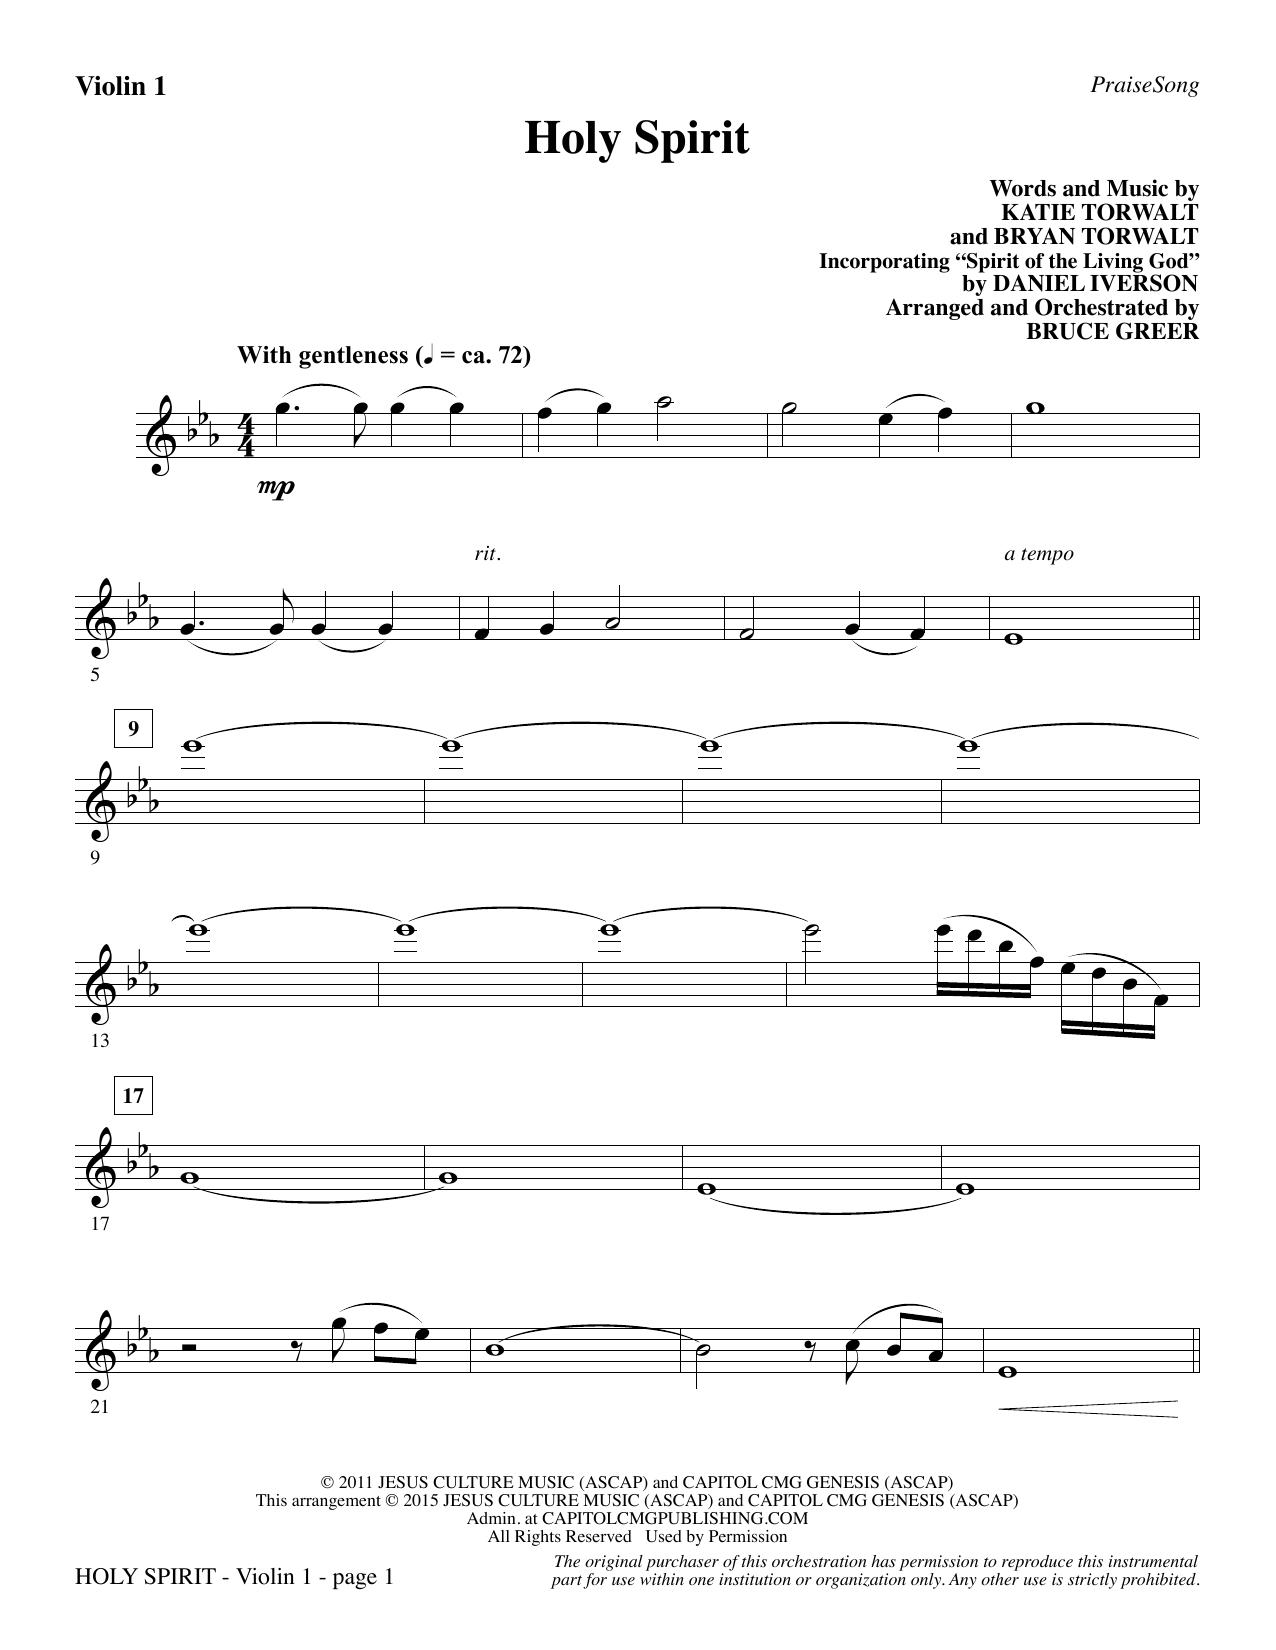 Holy Spirit - Violin 1 sheet music